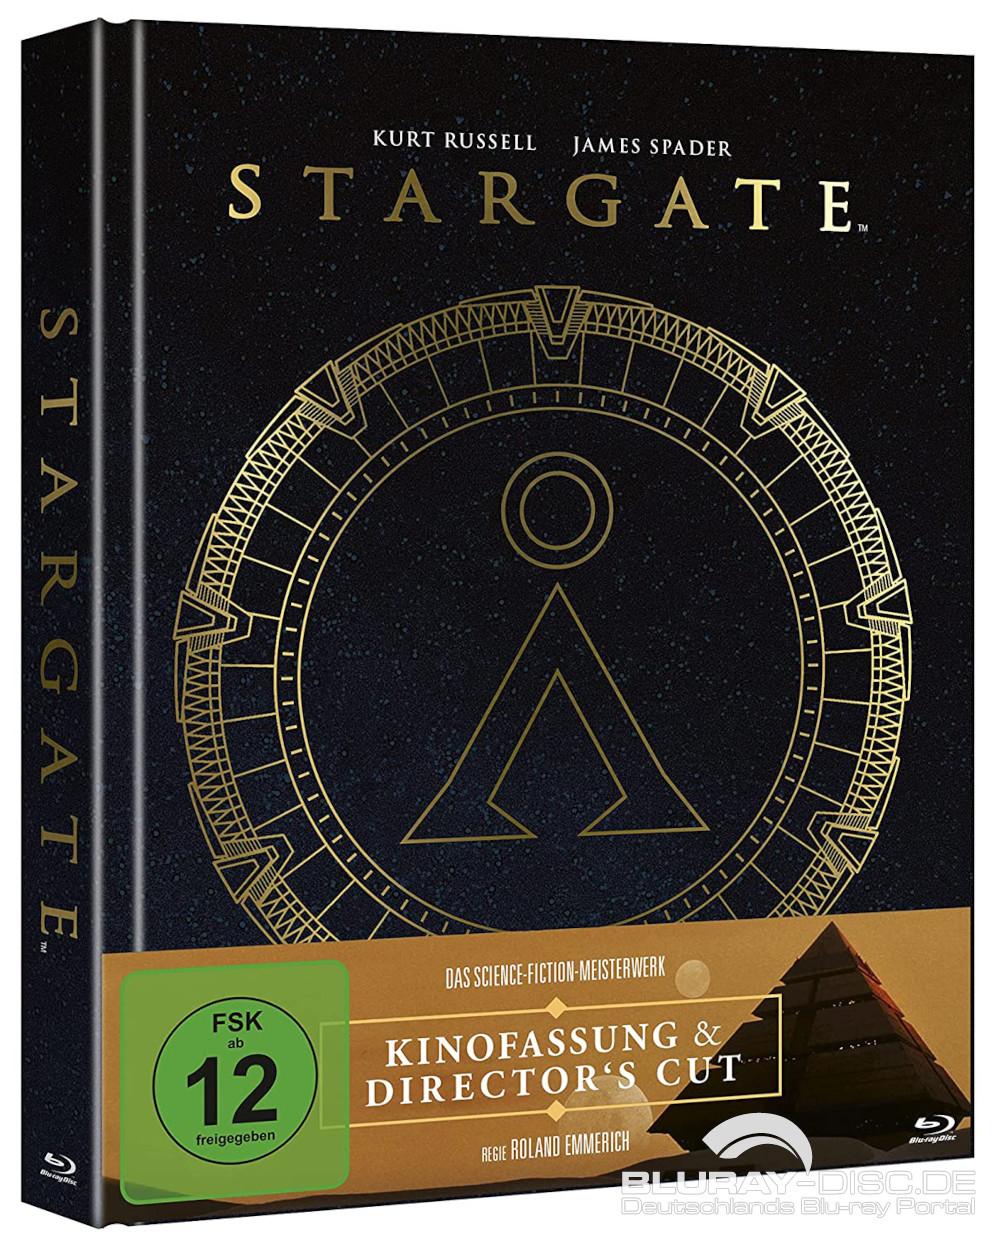 Stargate-Mediabook-Cover-A-Galerie-01.jpg